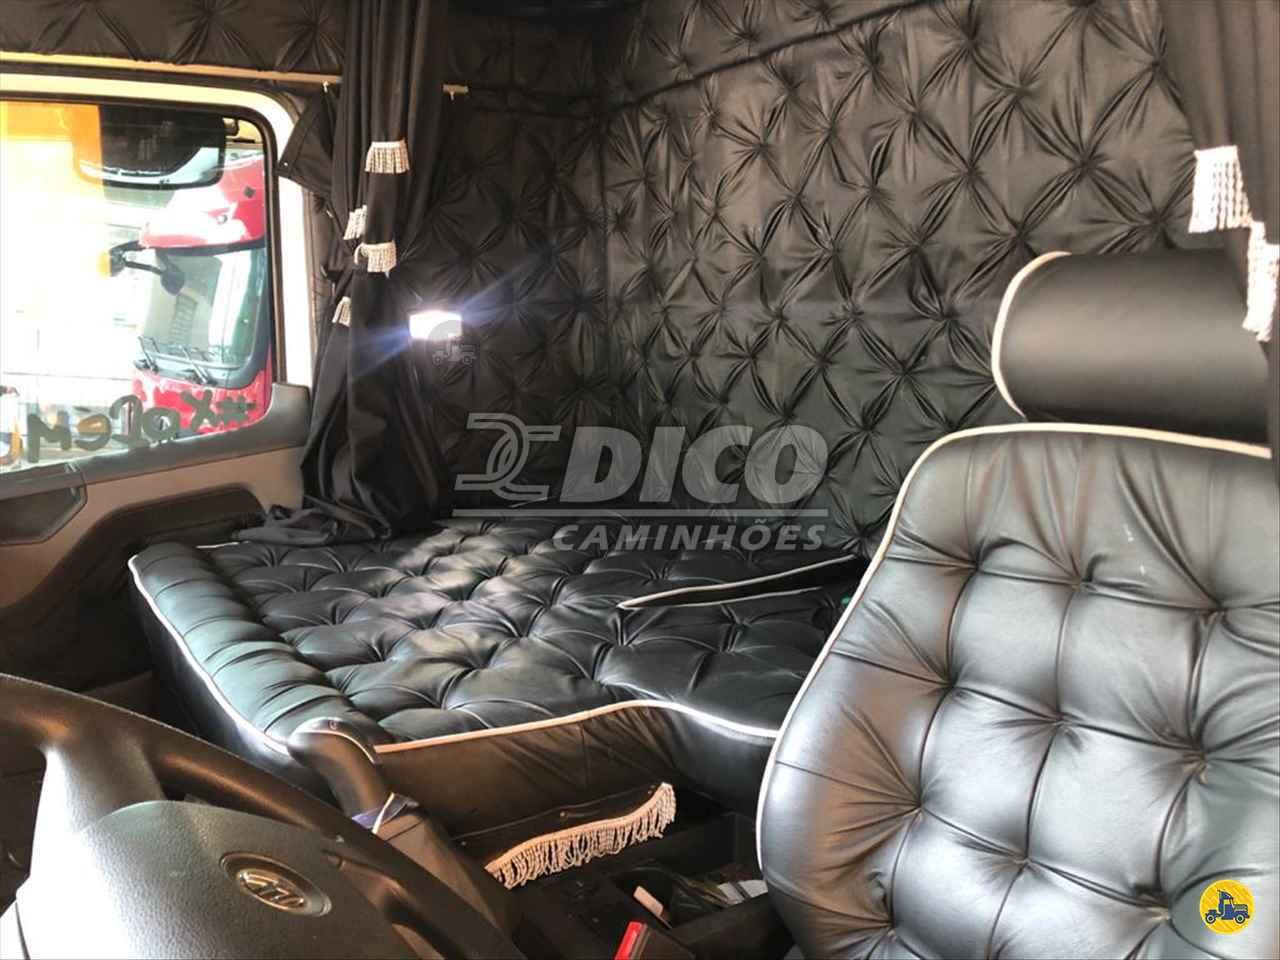 VOLKSWAGEN VW 30330 129600km 2019/2020 Dico Caminhões